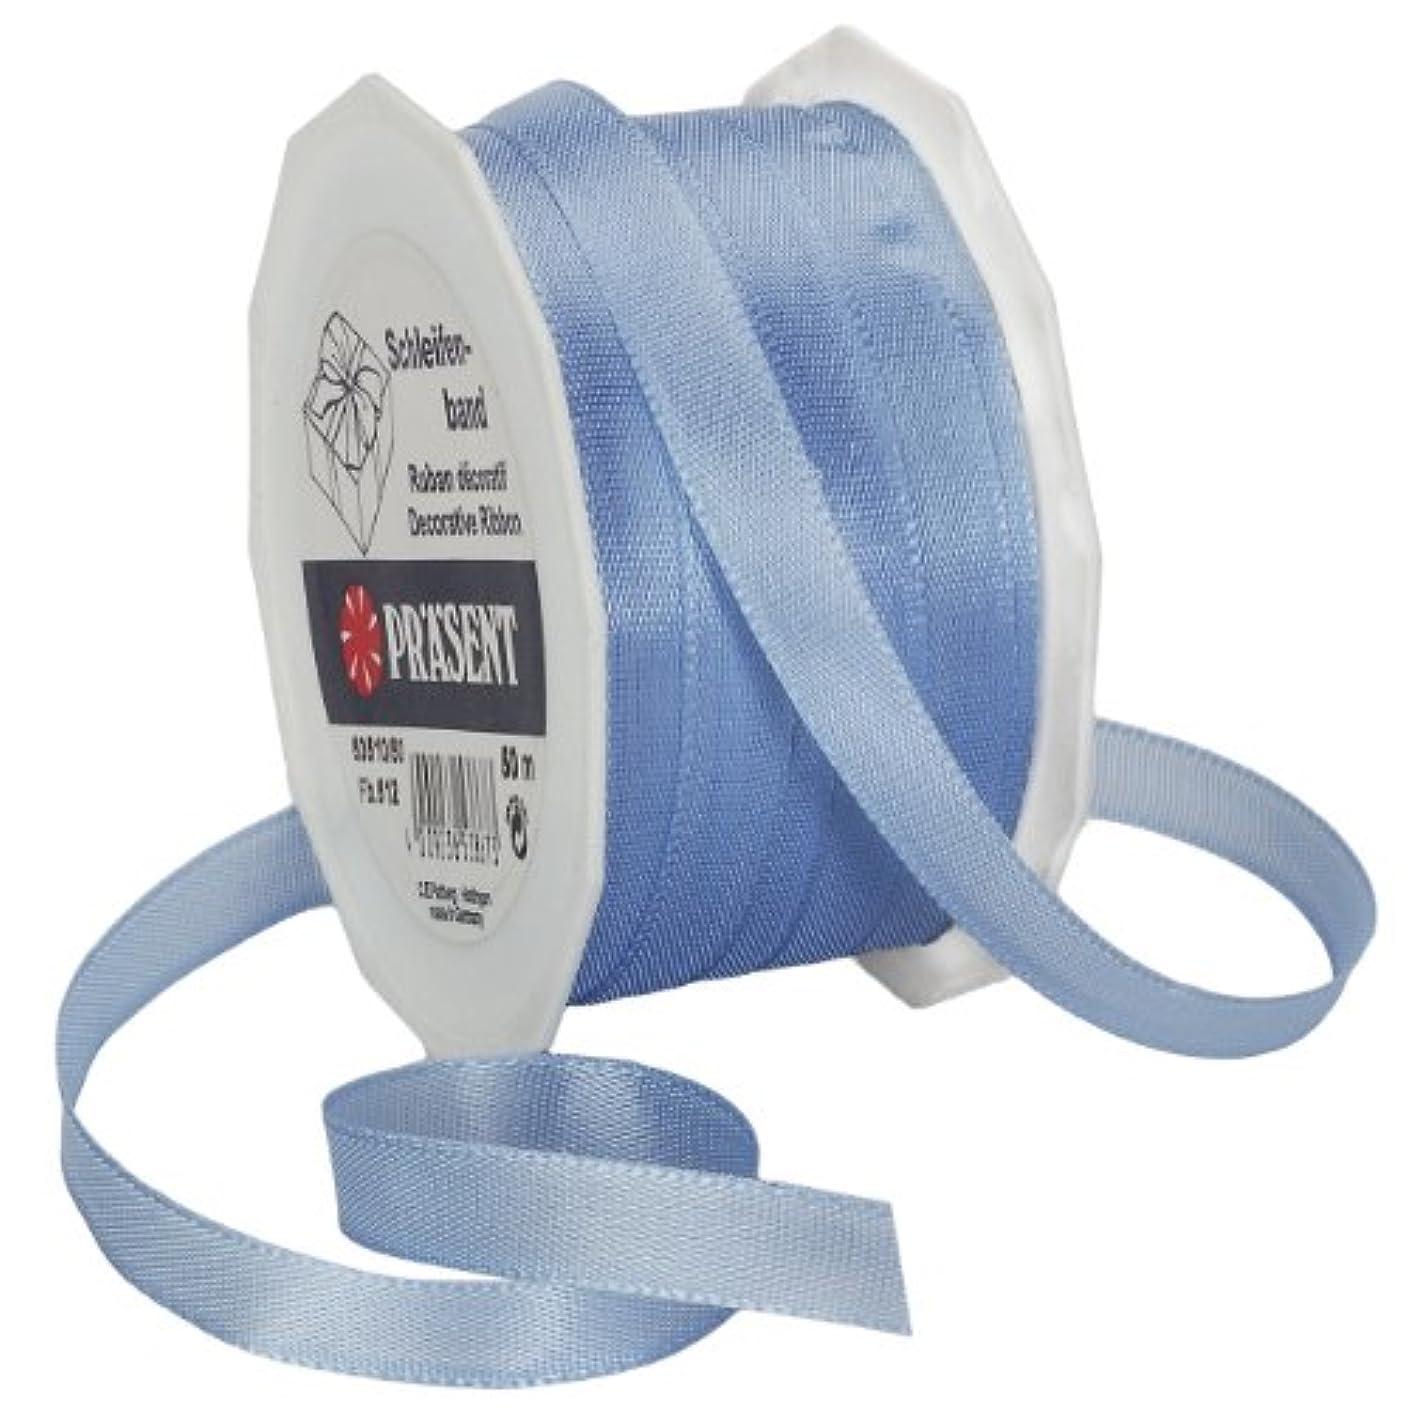 Morex Ribbon Europa Taffeta Ribbon Spool, 3/8-Inch by 55-Yard, Light Blue